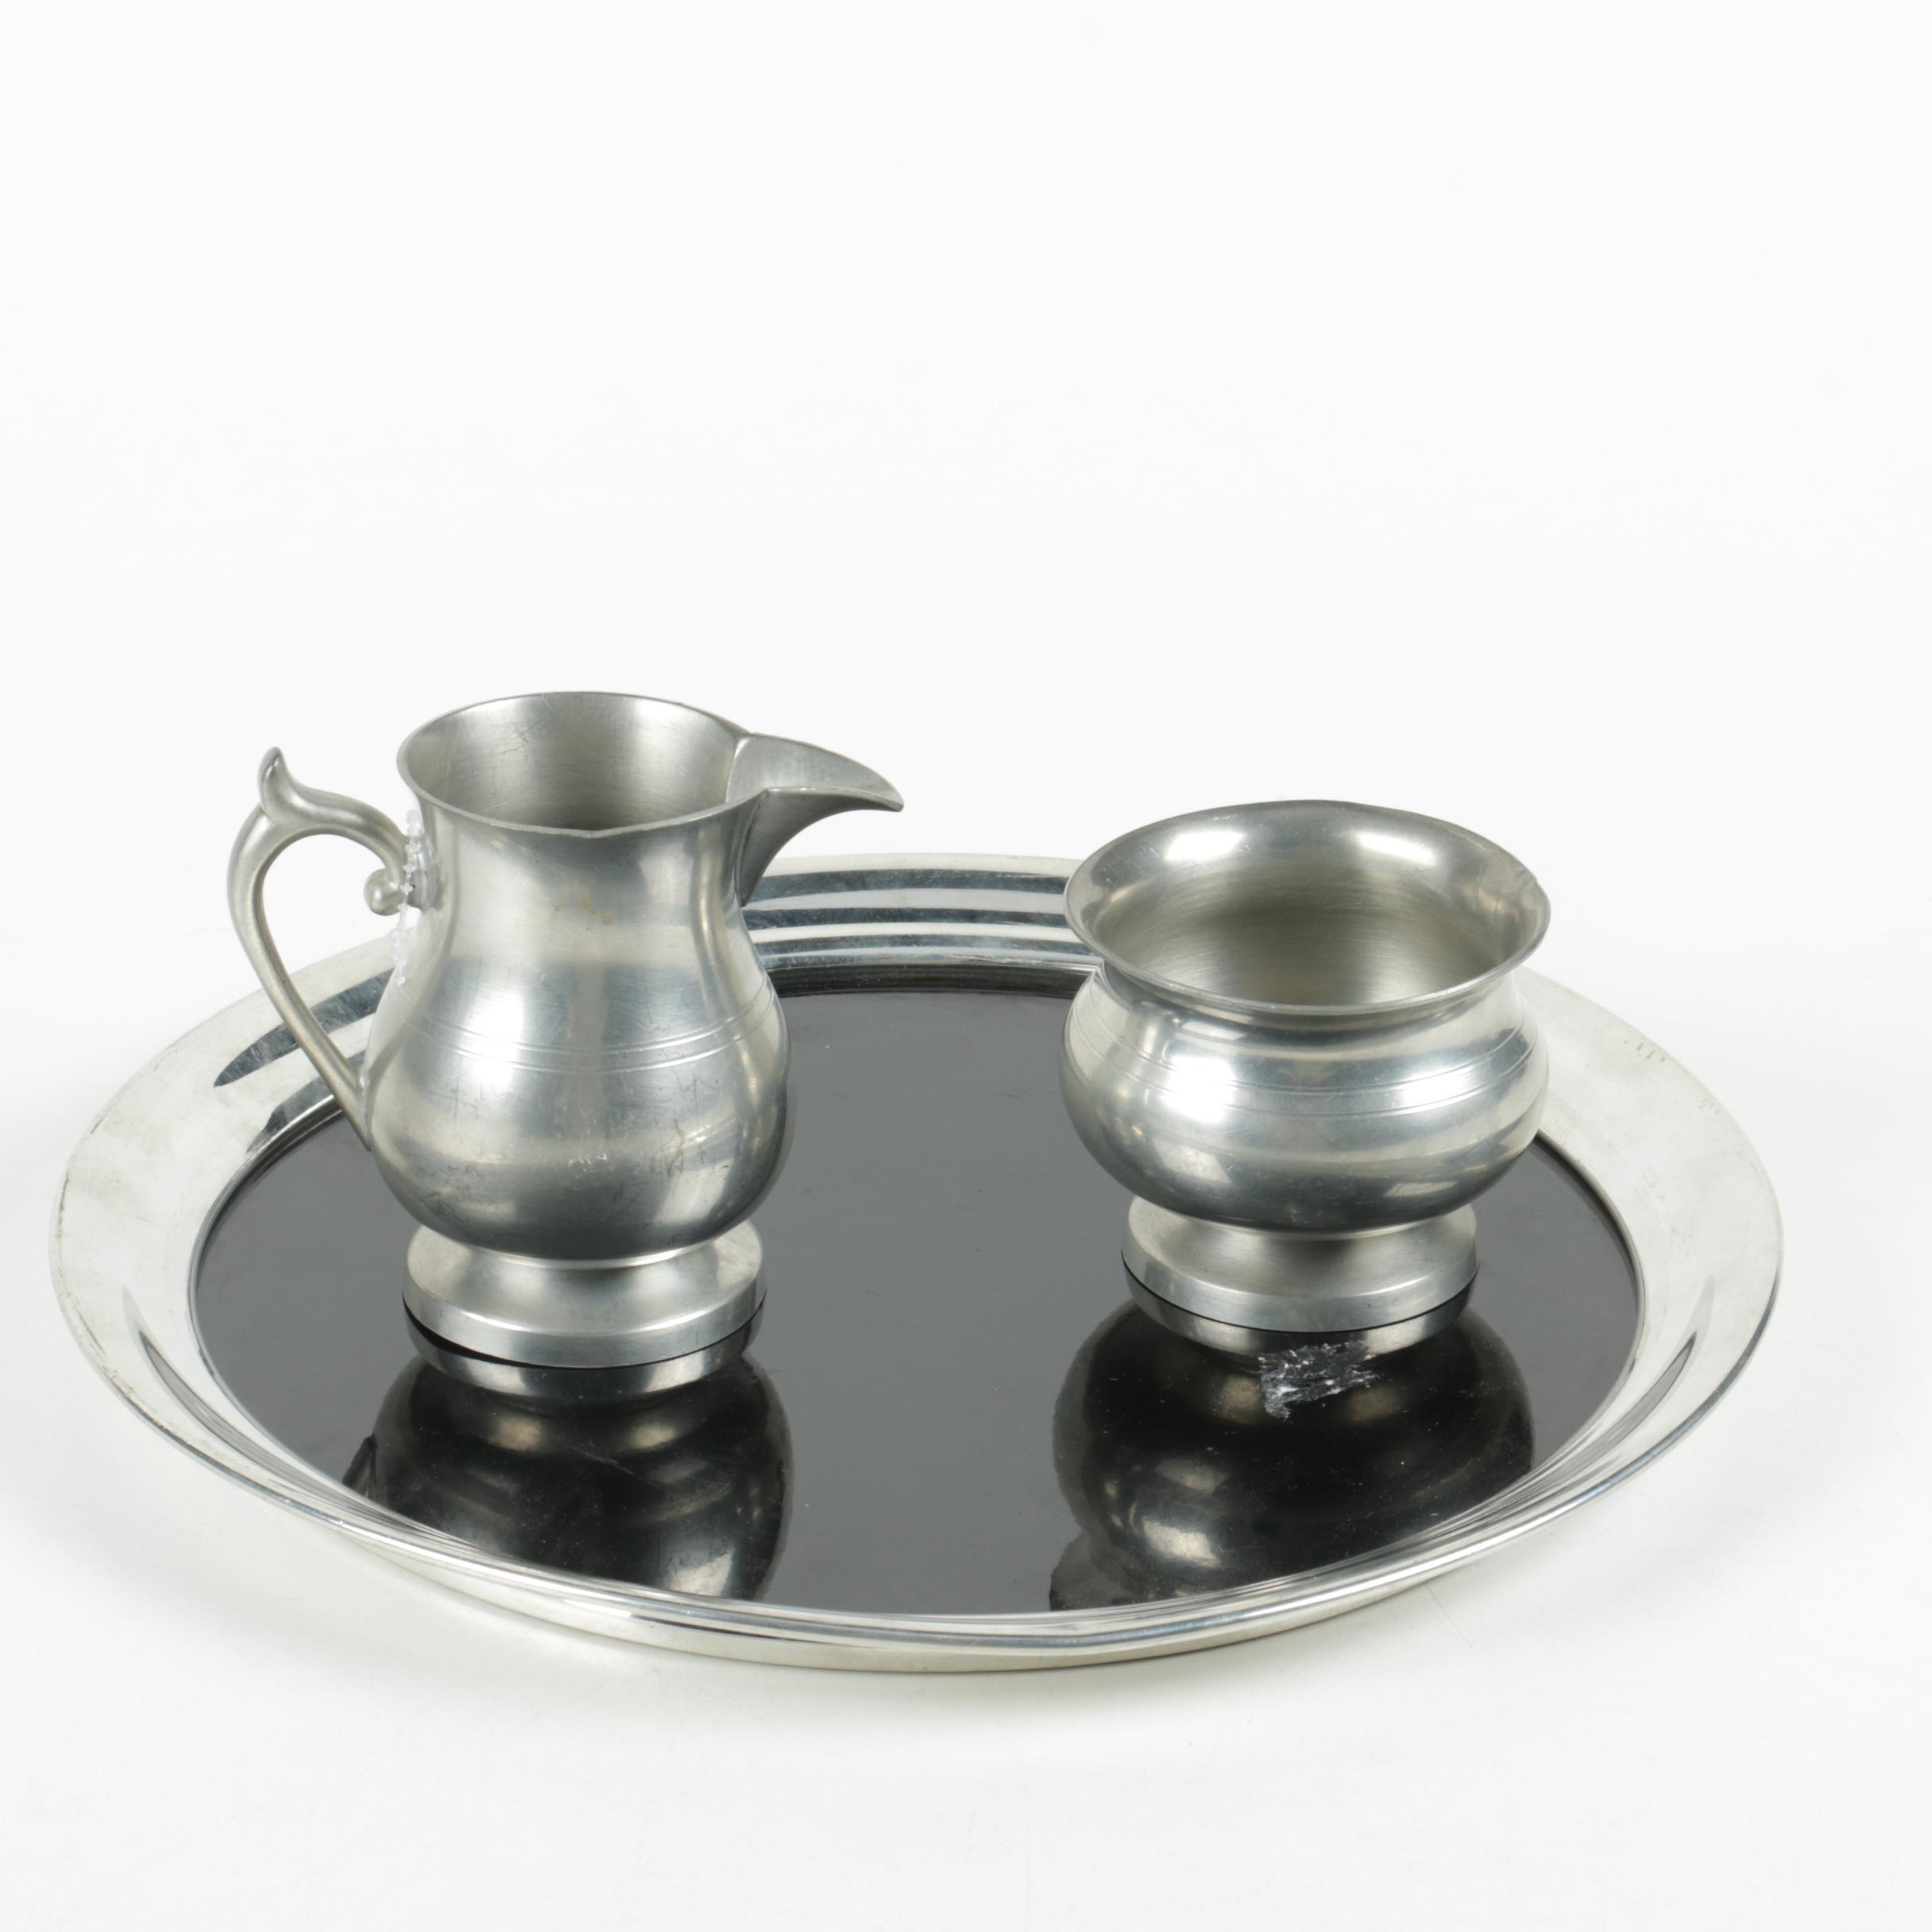 Woodbury And A.L. Hanle Pewter Tableware ...